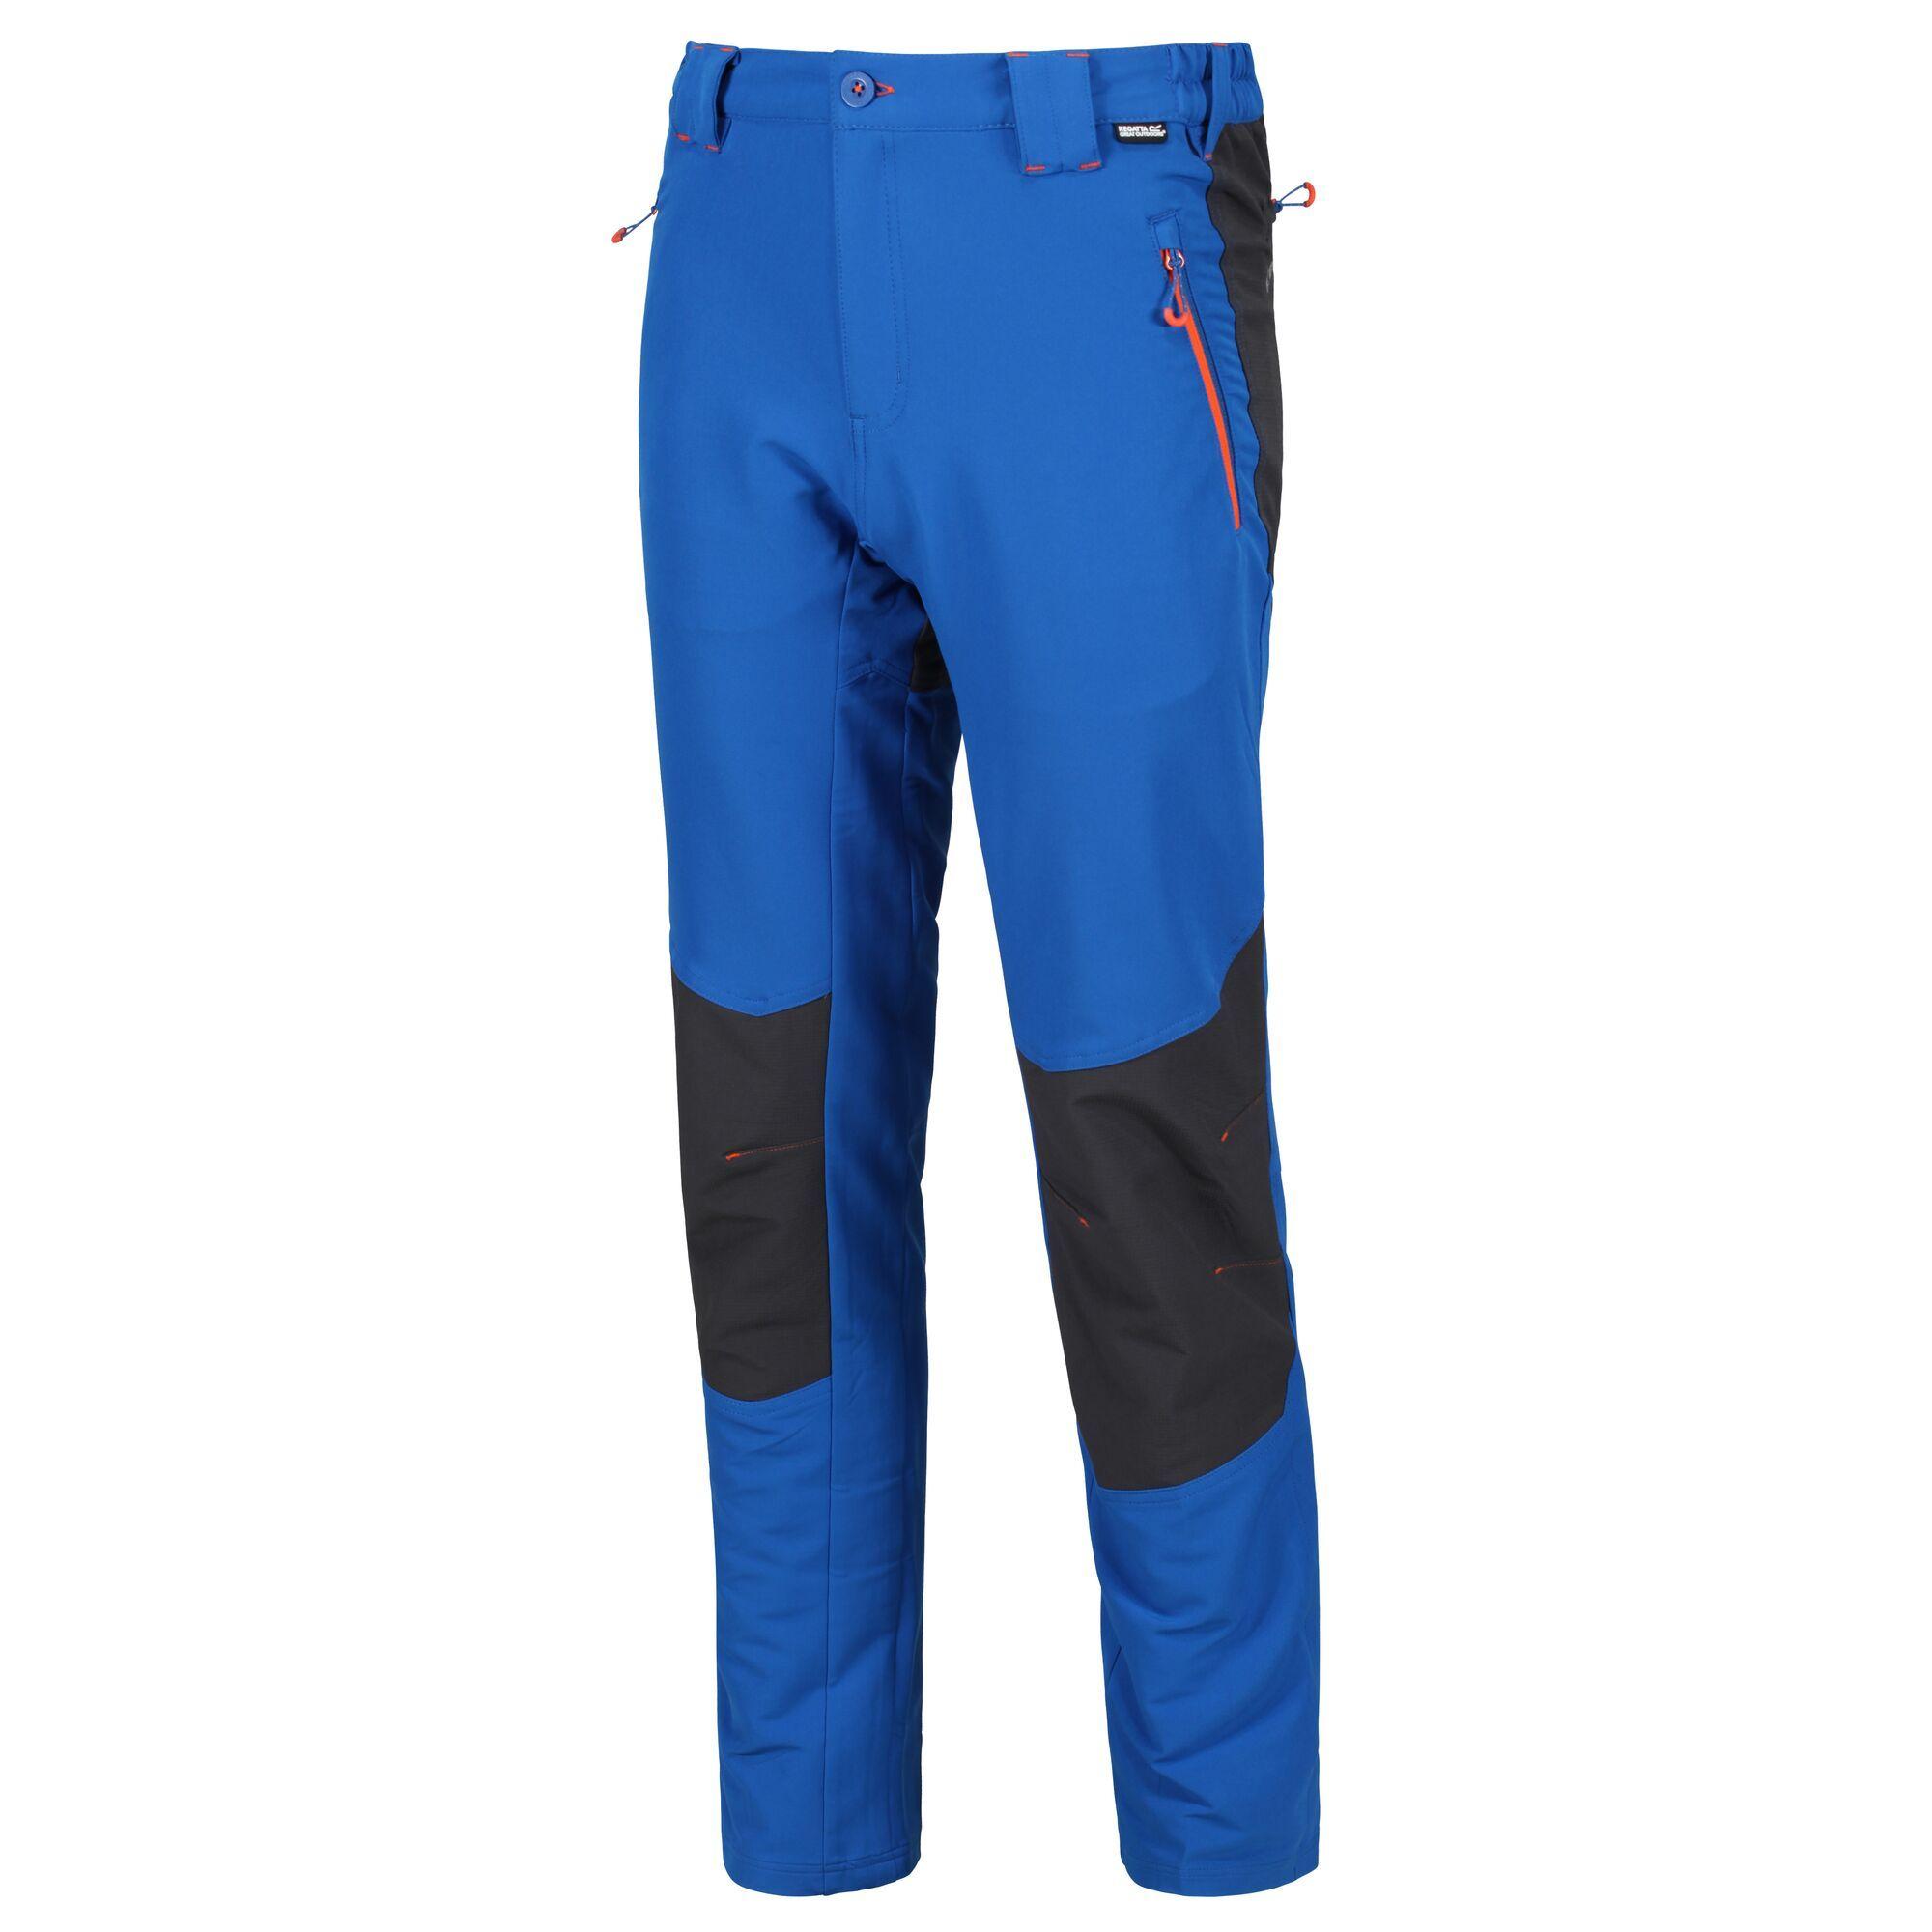 Regatta-Questra-Mens-Ripstop-Knee-Panel-Softshell-Walking-Trousers-RRP-80 thumbnail 5